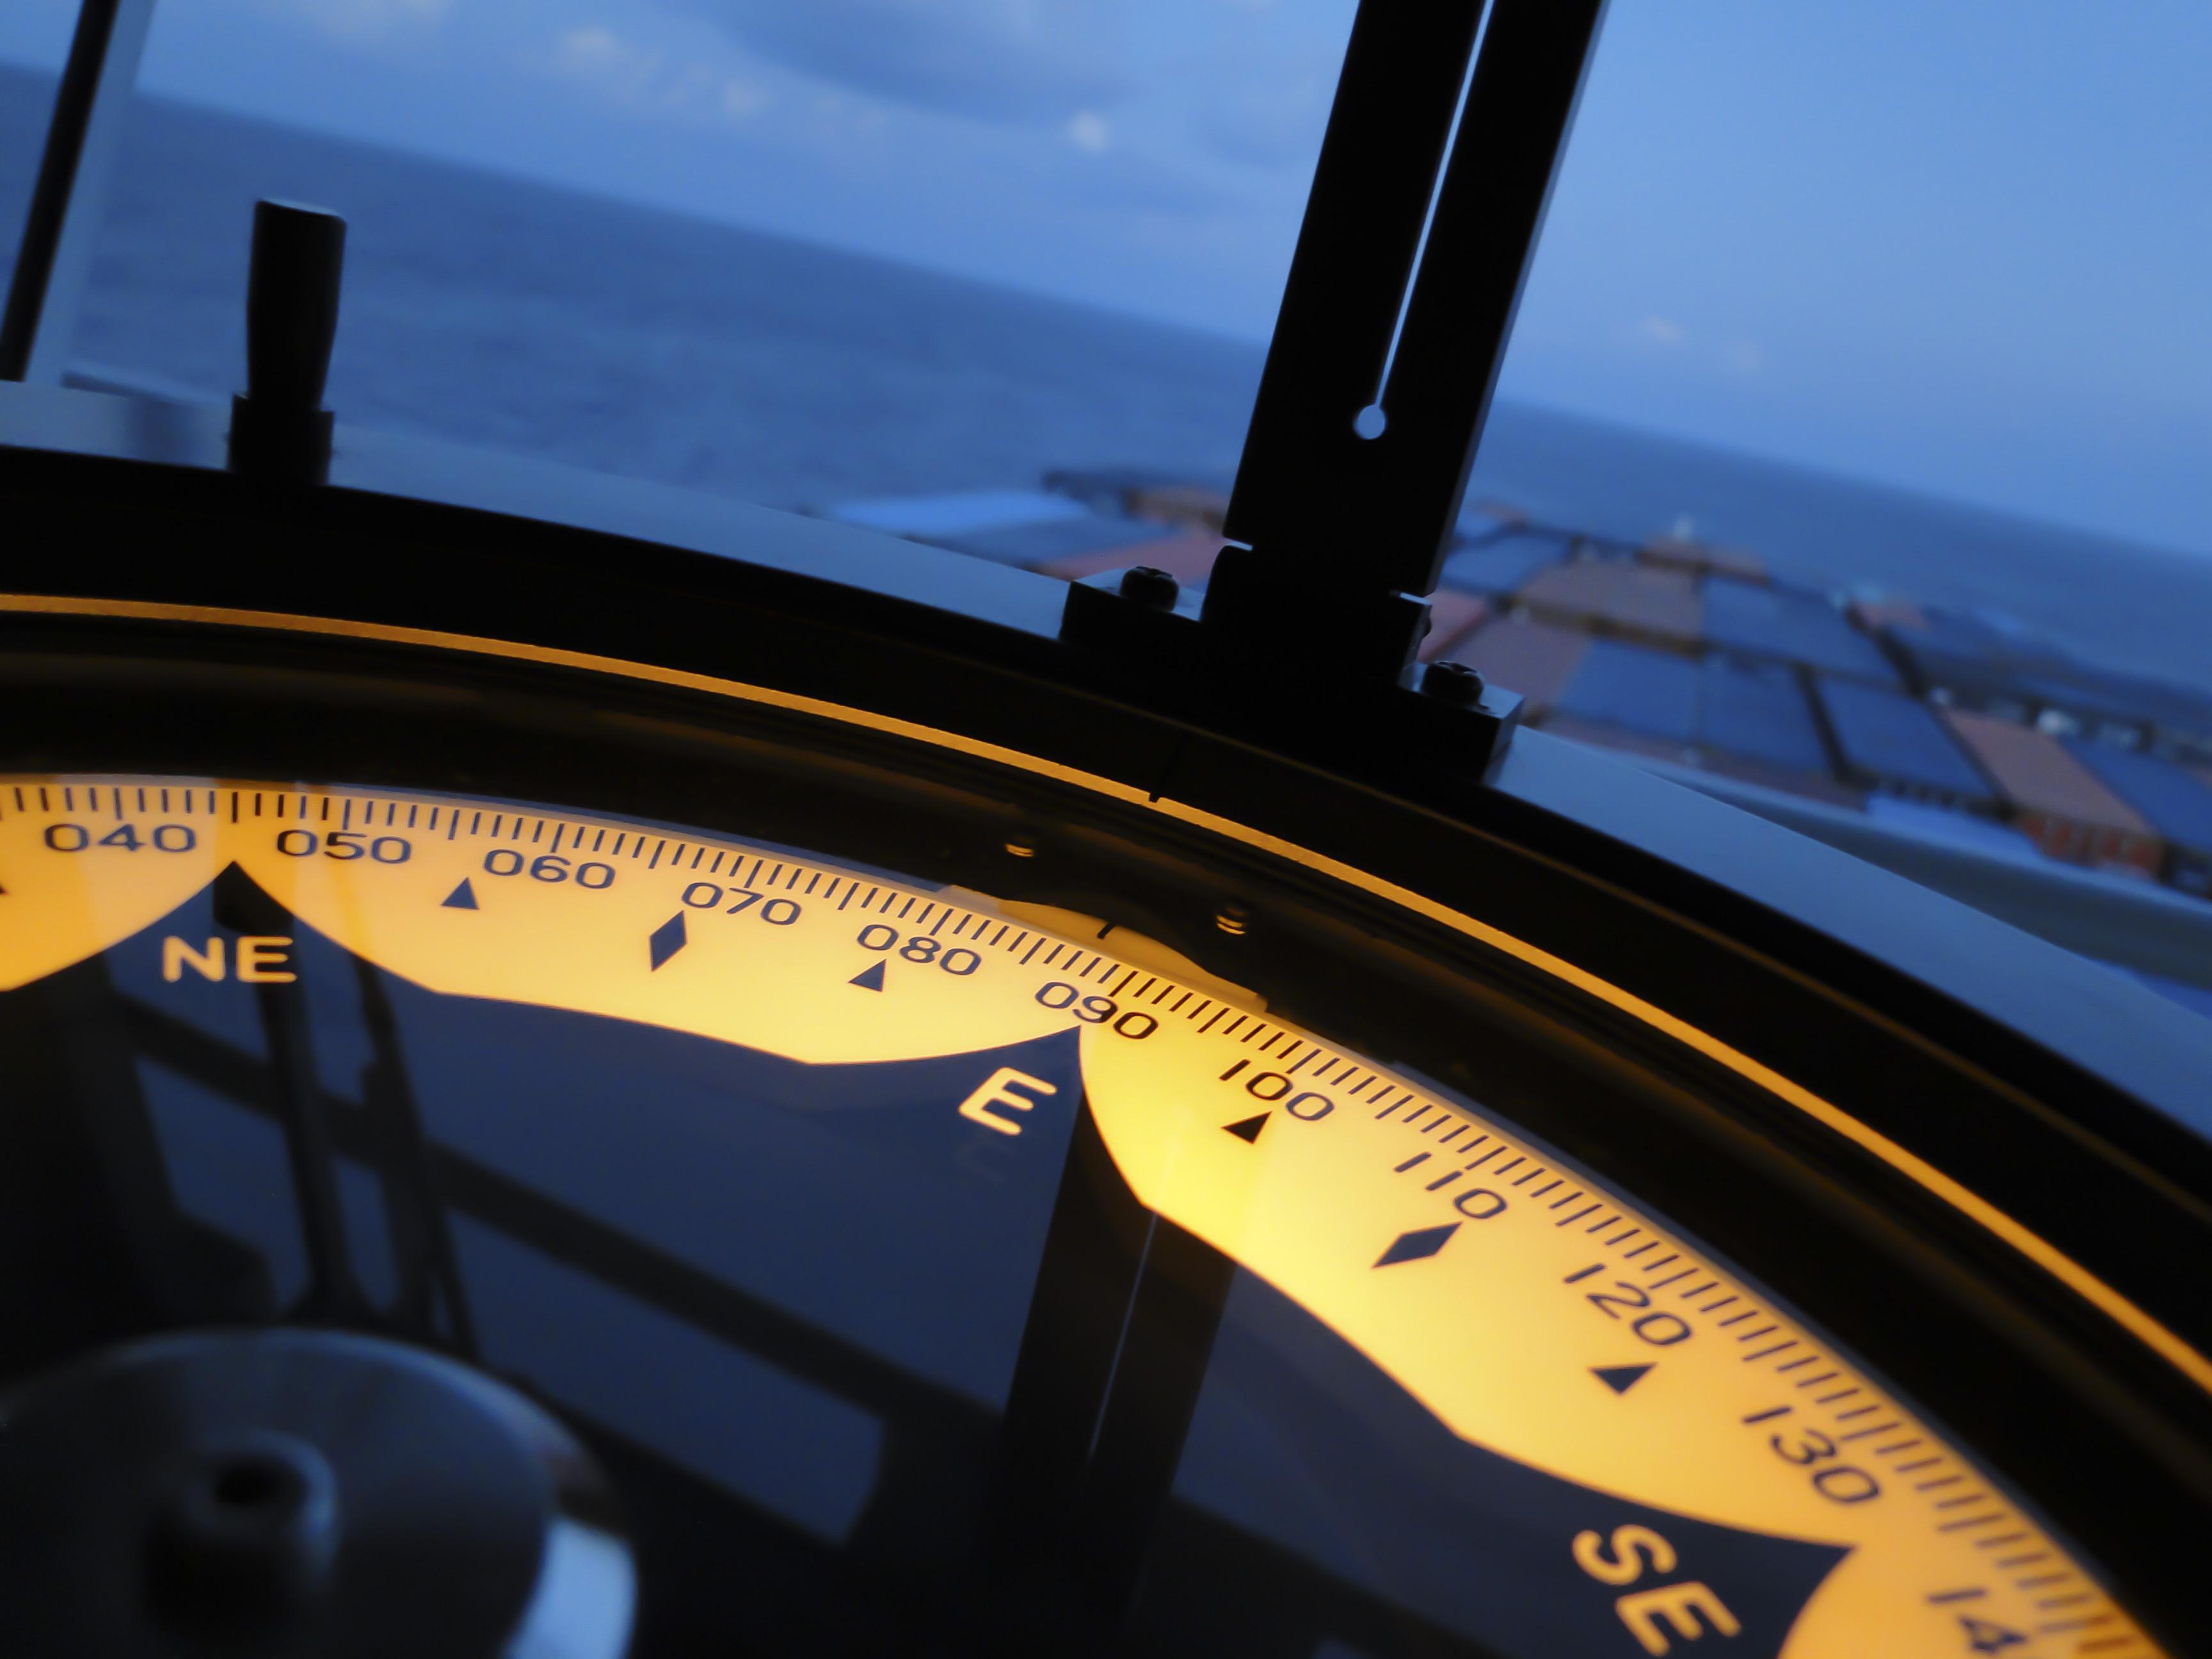 Marine gyro compass aboard ocean freighter.